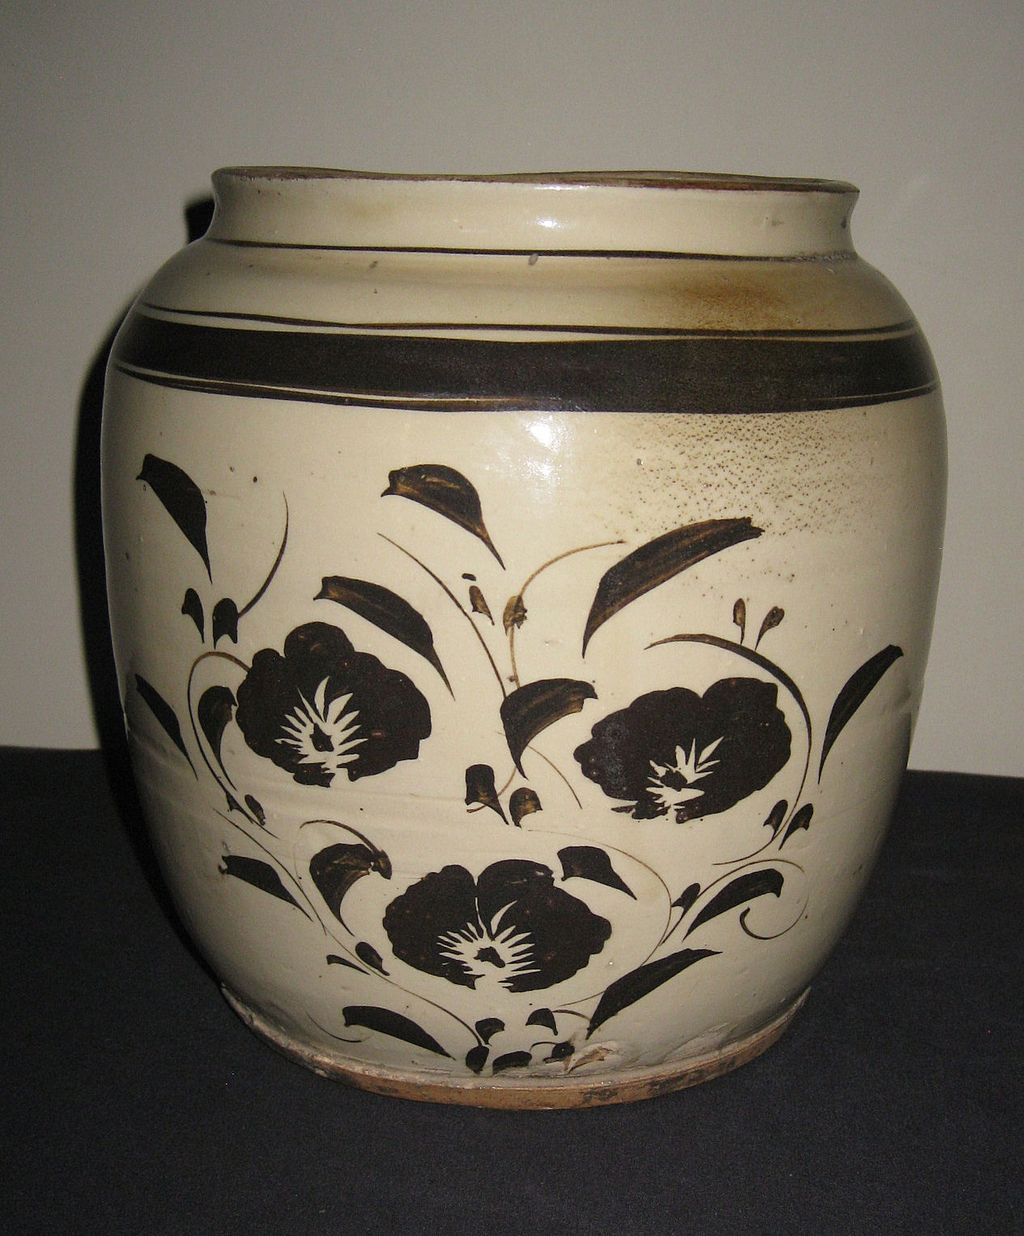 19th C. Chinese Pottery Cizhou Glazed Jar